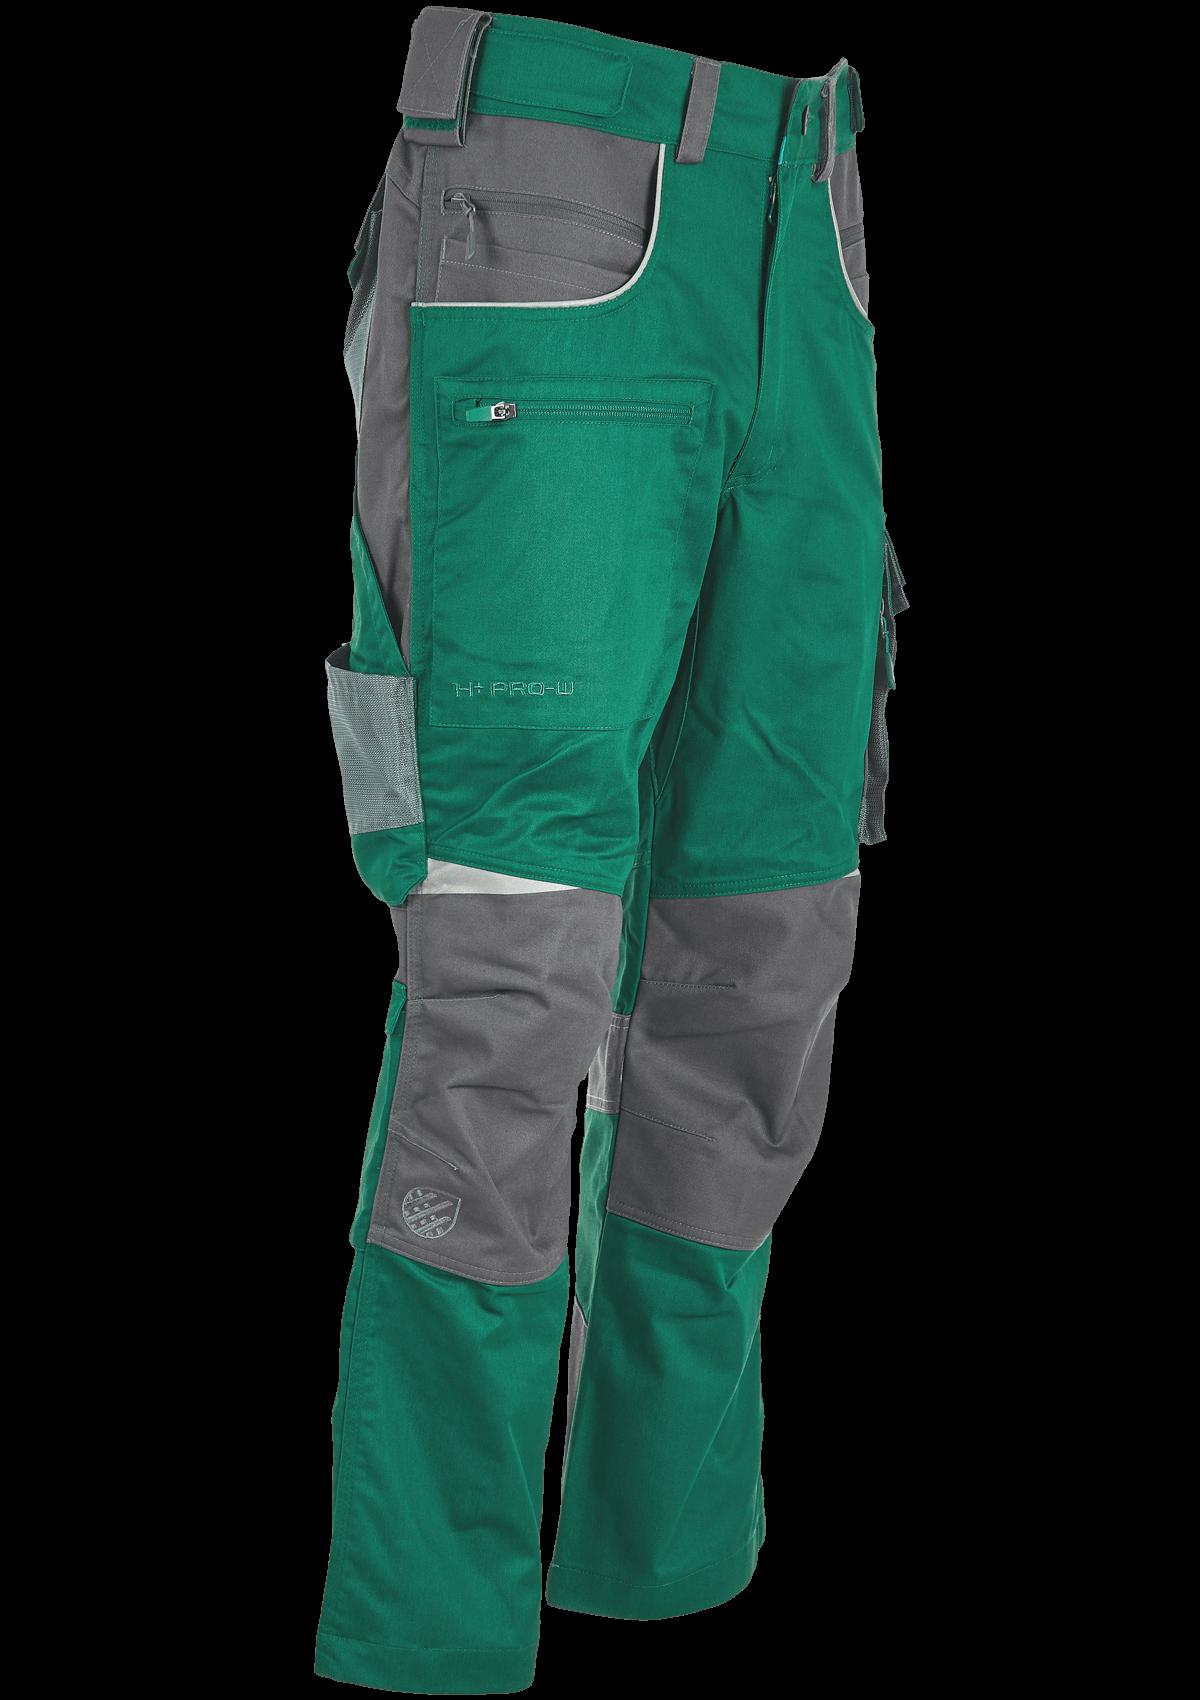 Bundhose NORDURA™ PRO-W - Moos / Zement